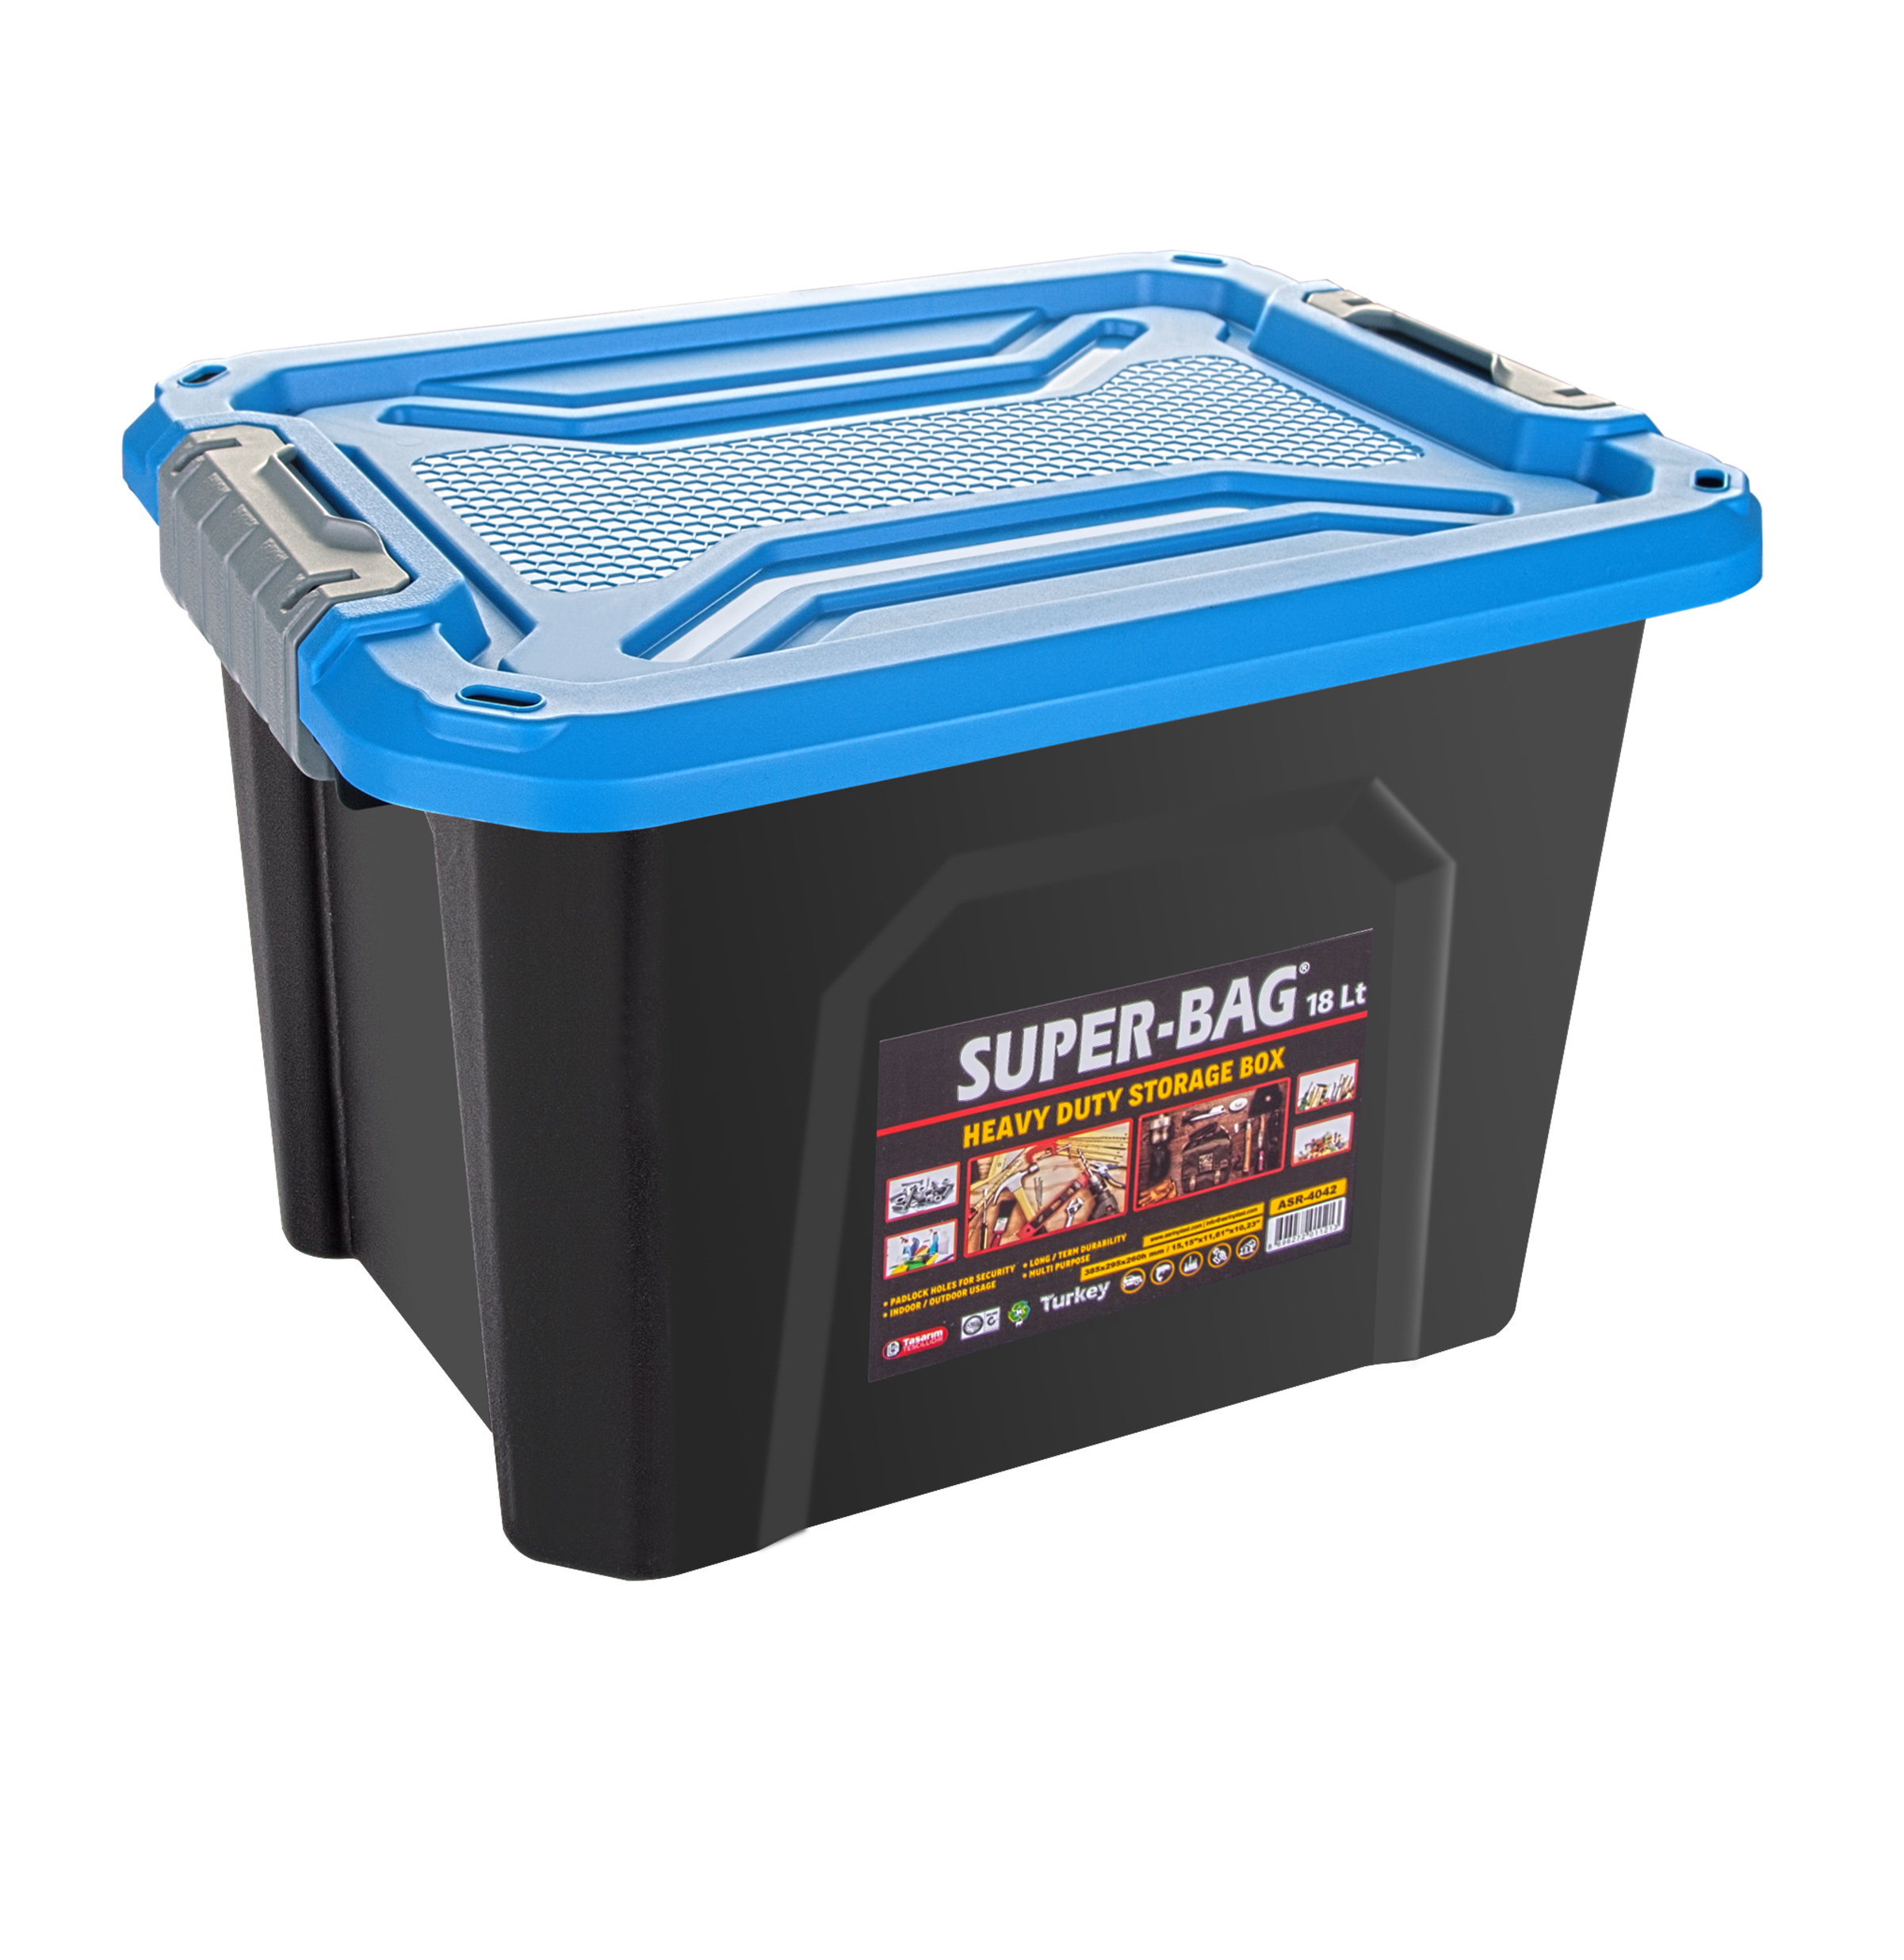 ASR-4042 Superbag Saklama Kutusu Renkli Kapak 18 LT